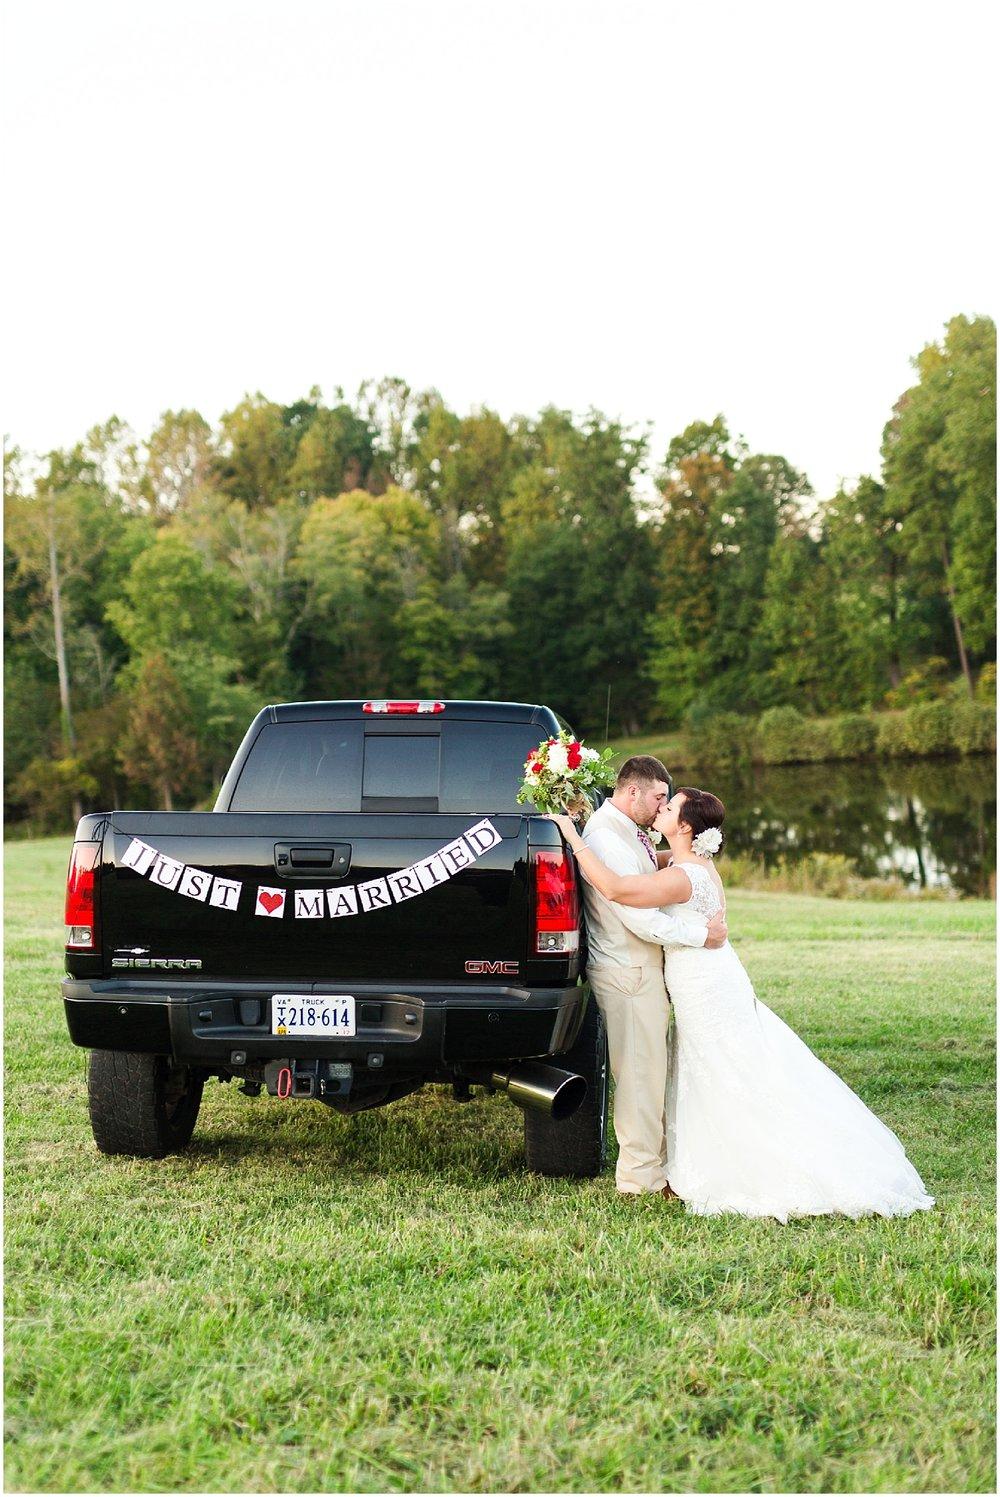 Rustic Country Wedding Virginia Photographer (46).jpg